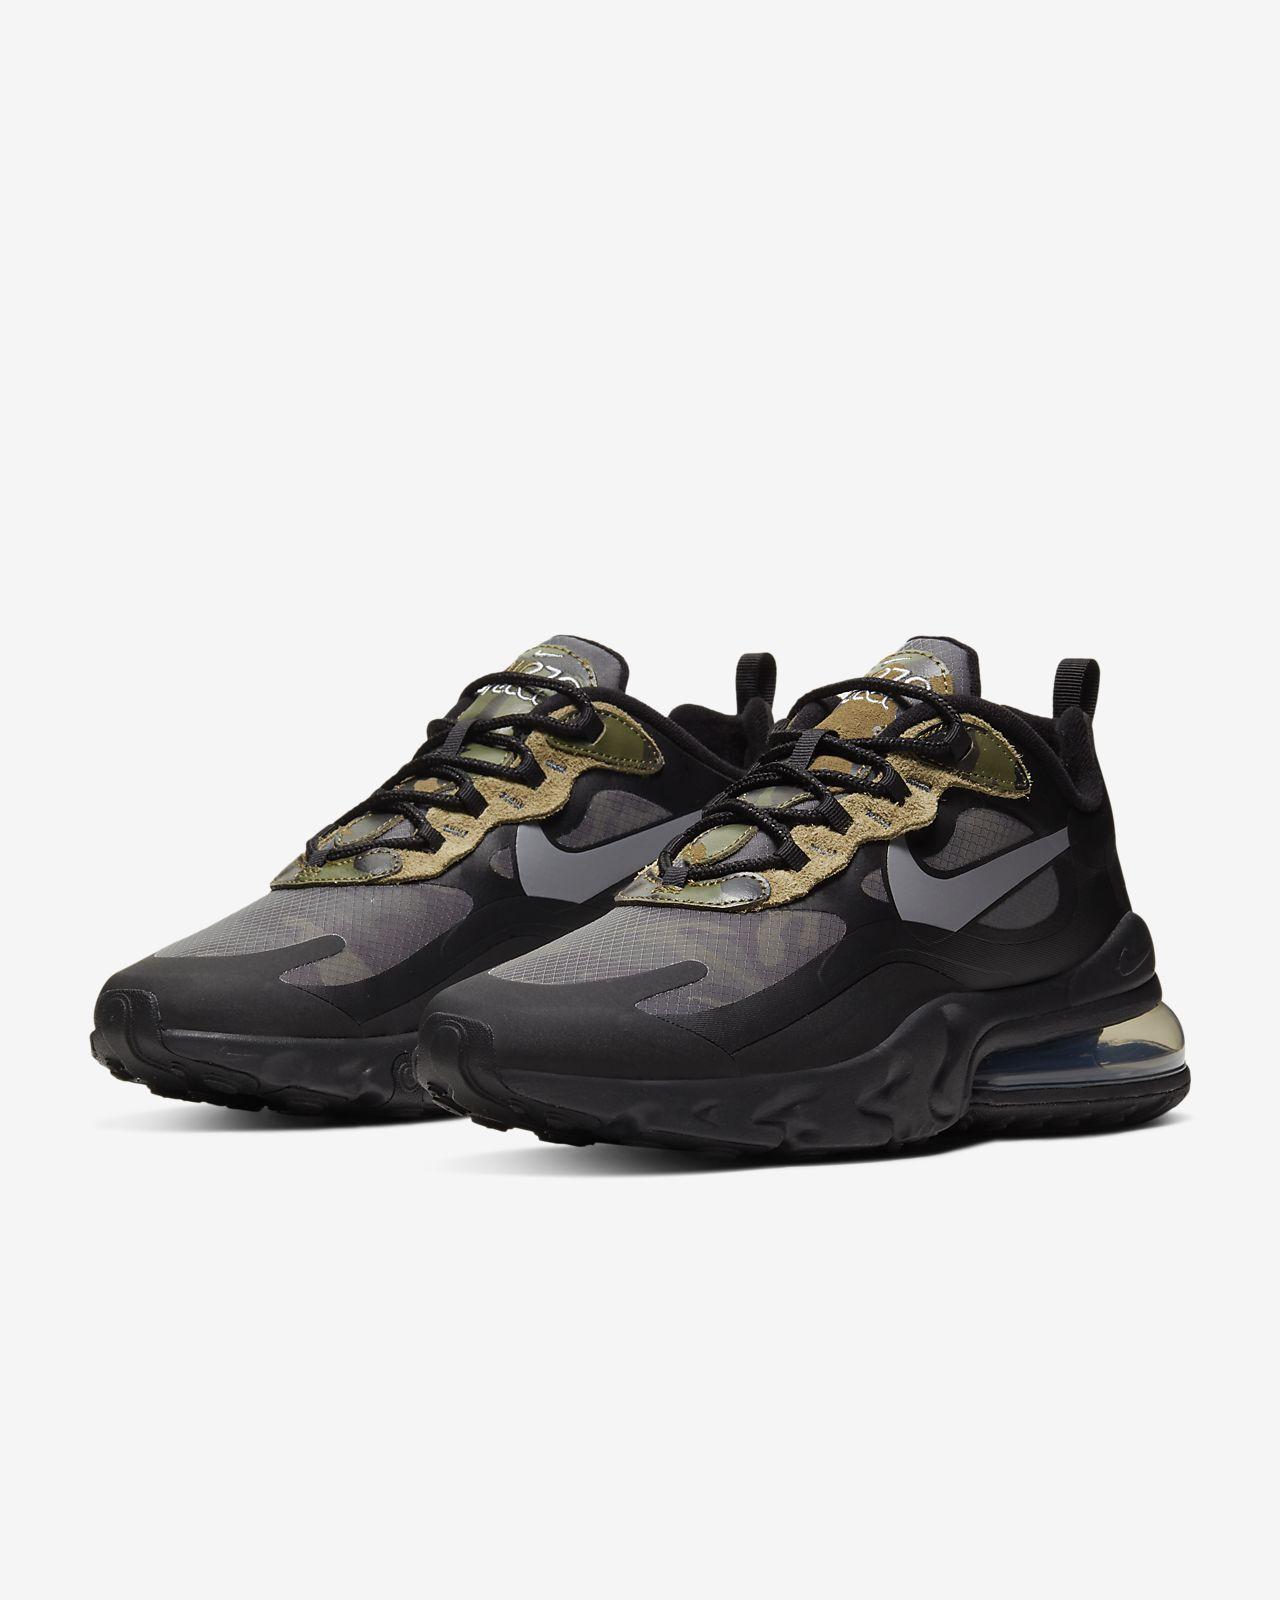 nike air max 270 react chaussure de course homme